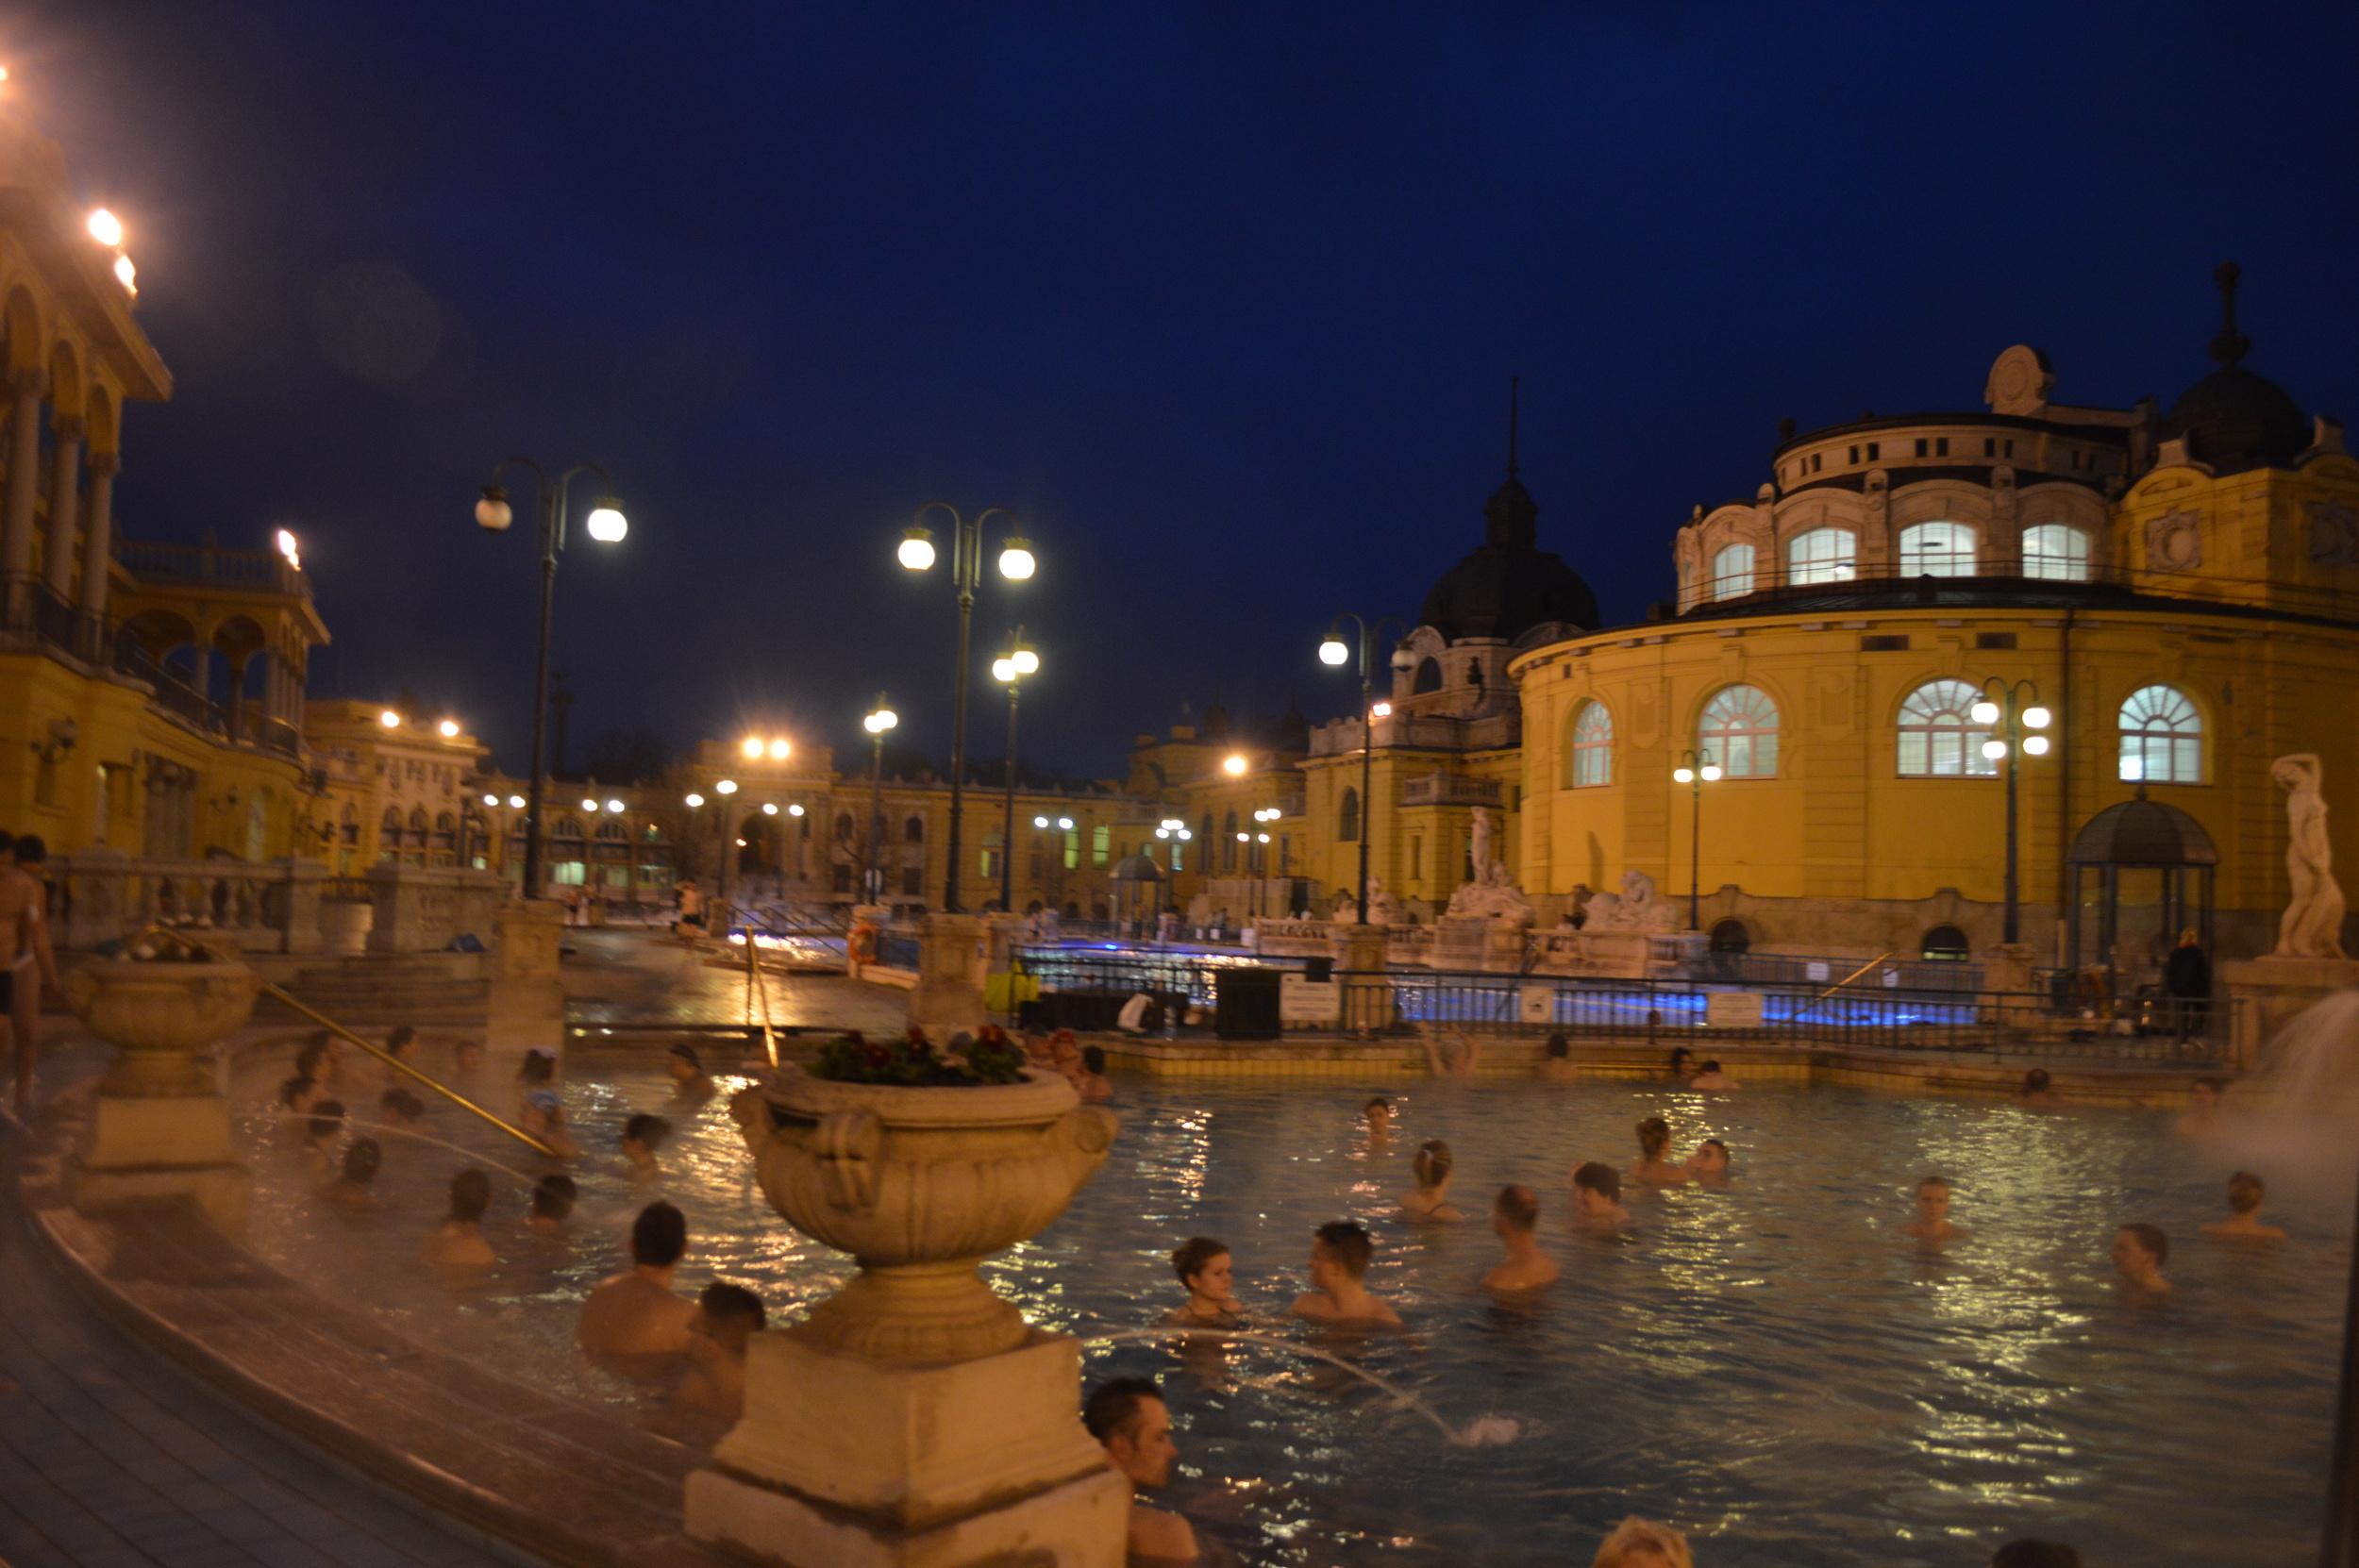 Szechenyi-baths-budapest-hungary.jpg